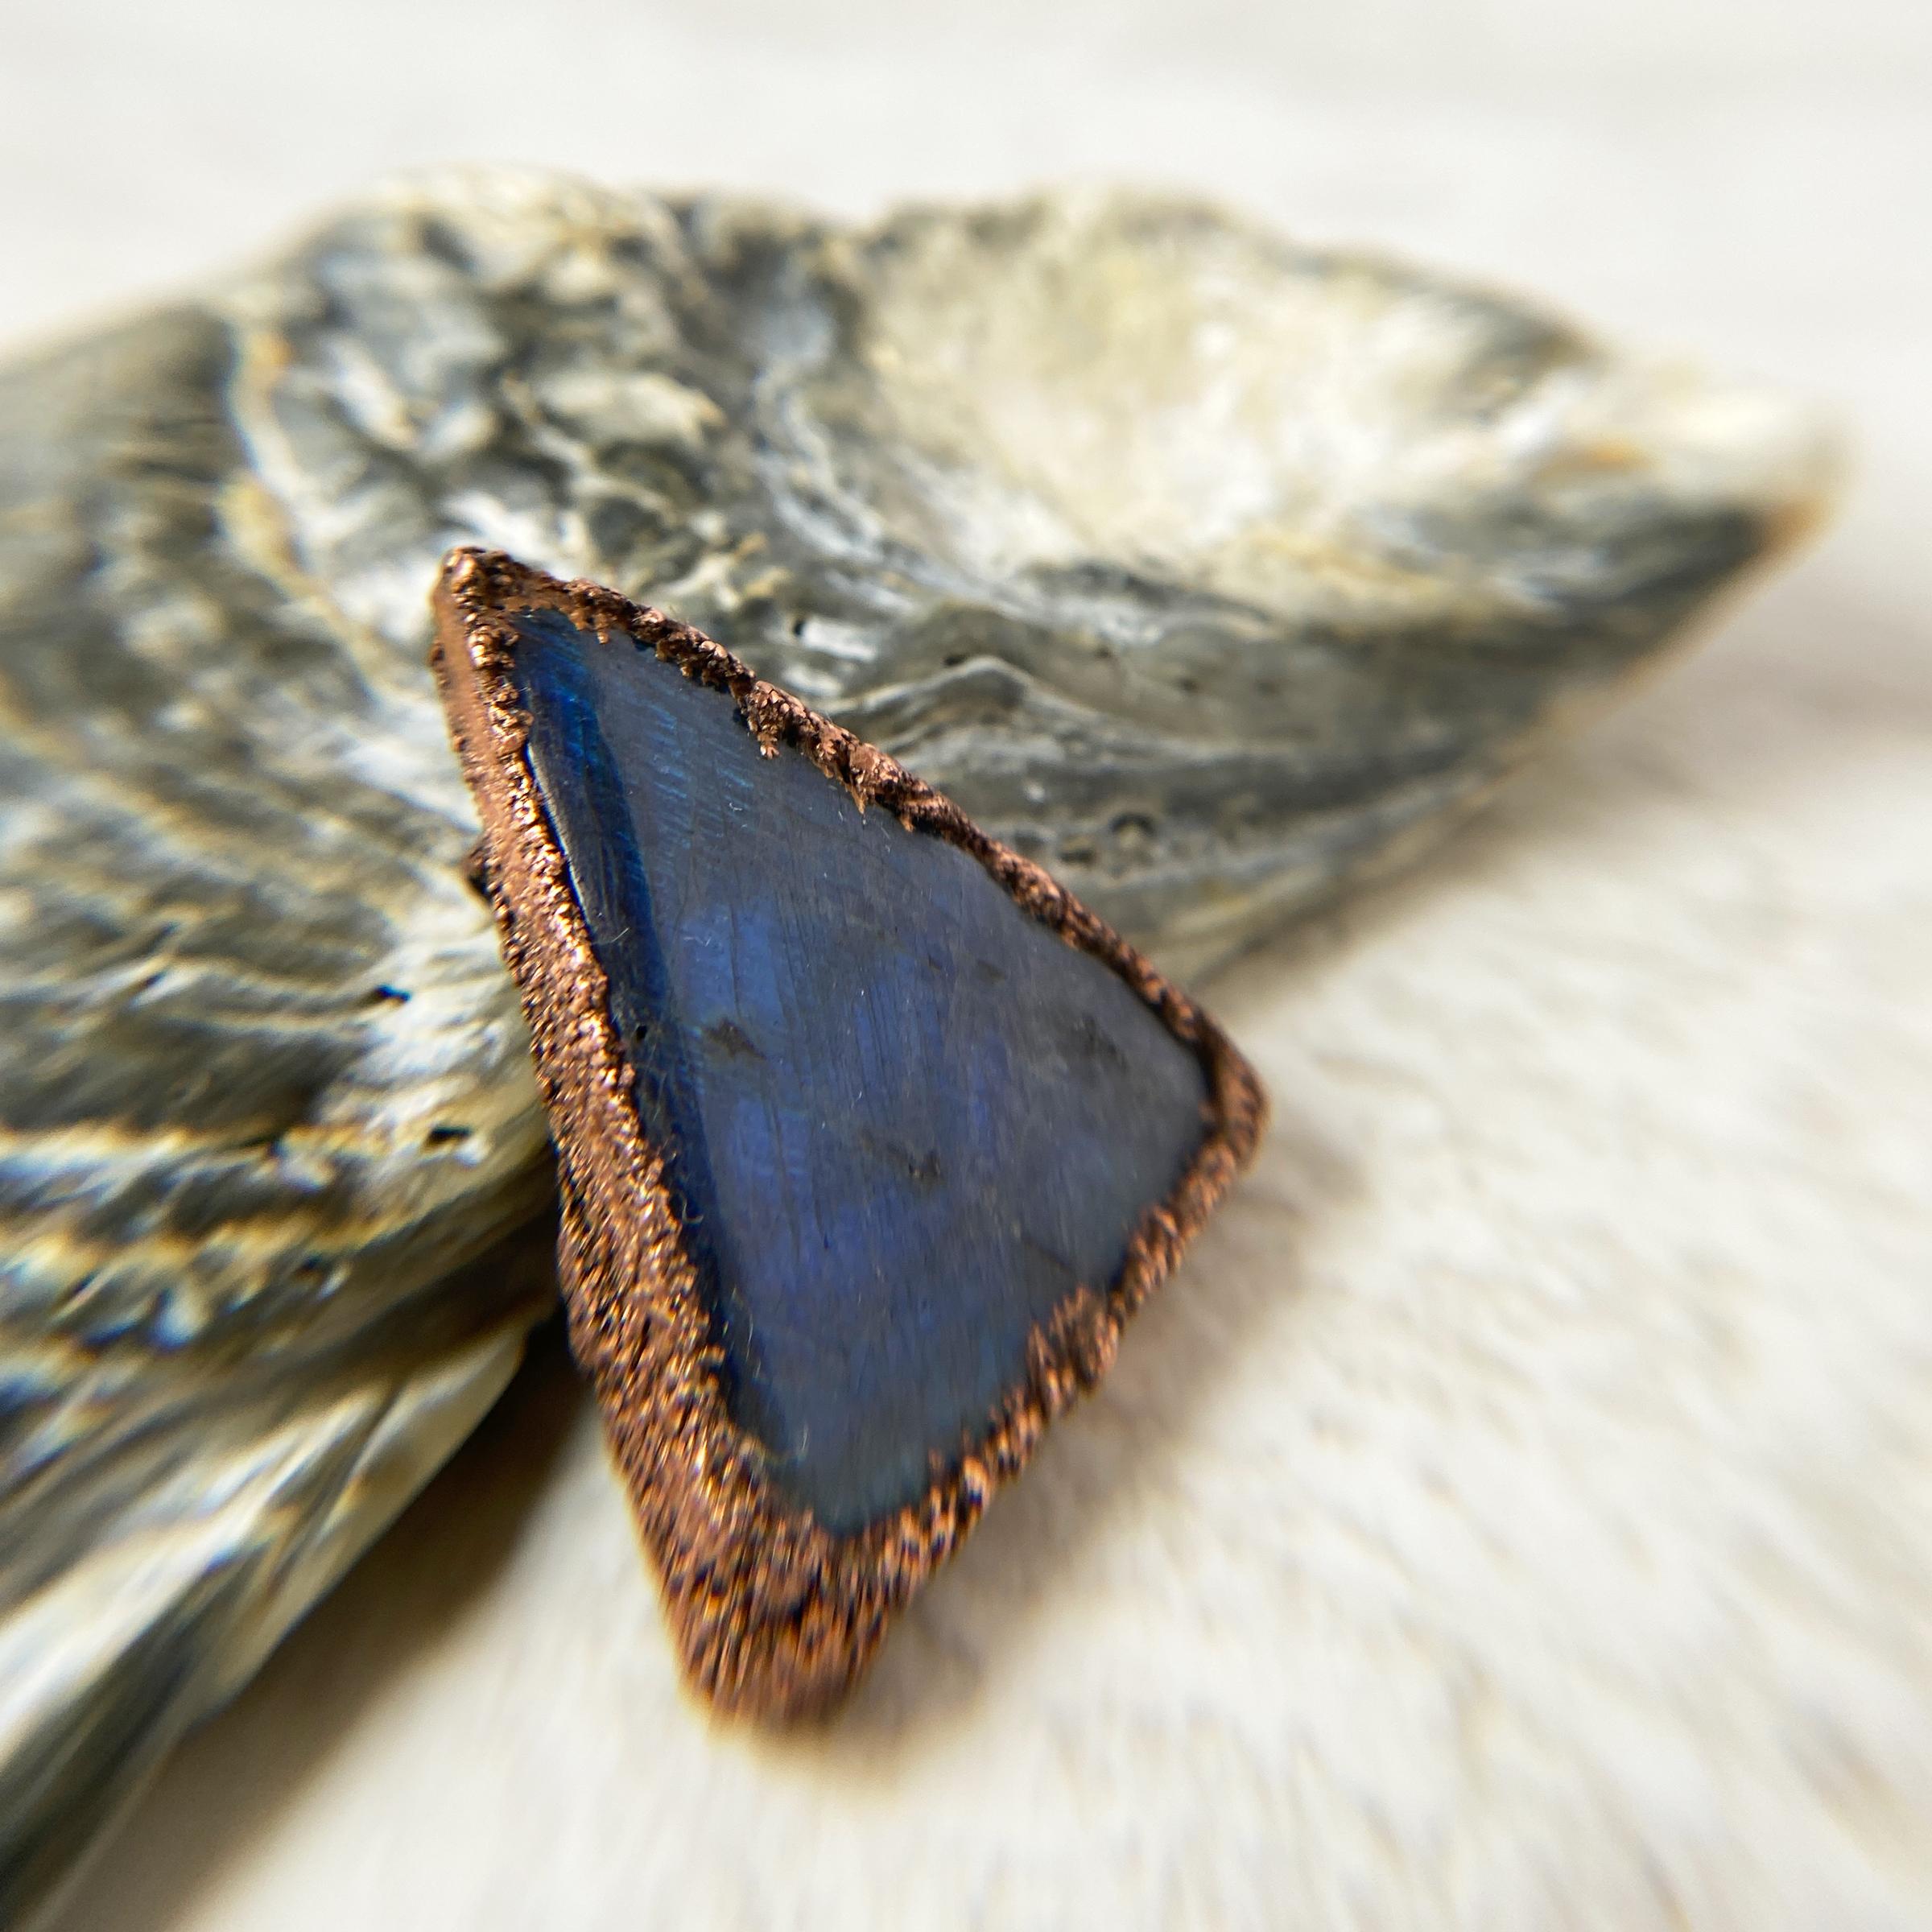 electroformed copper labradorite pendant